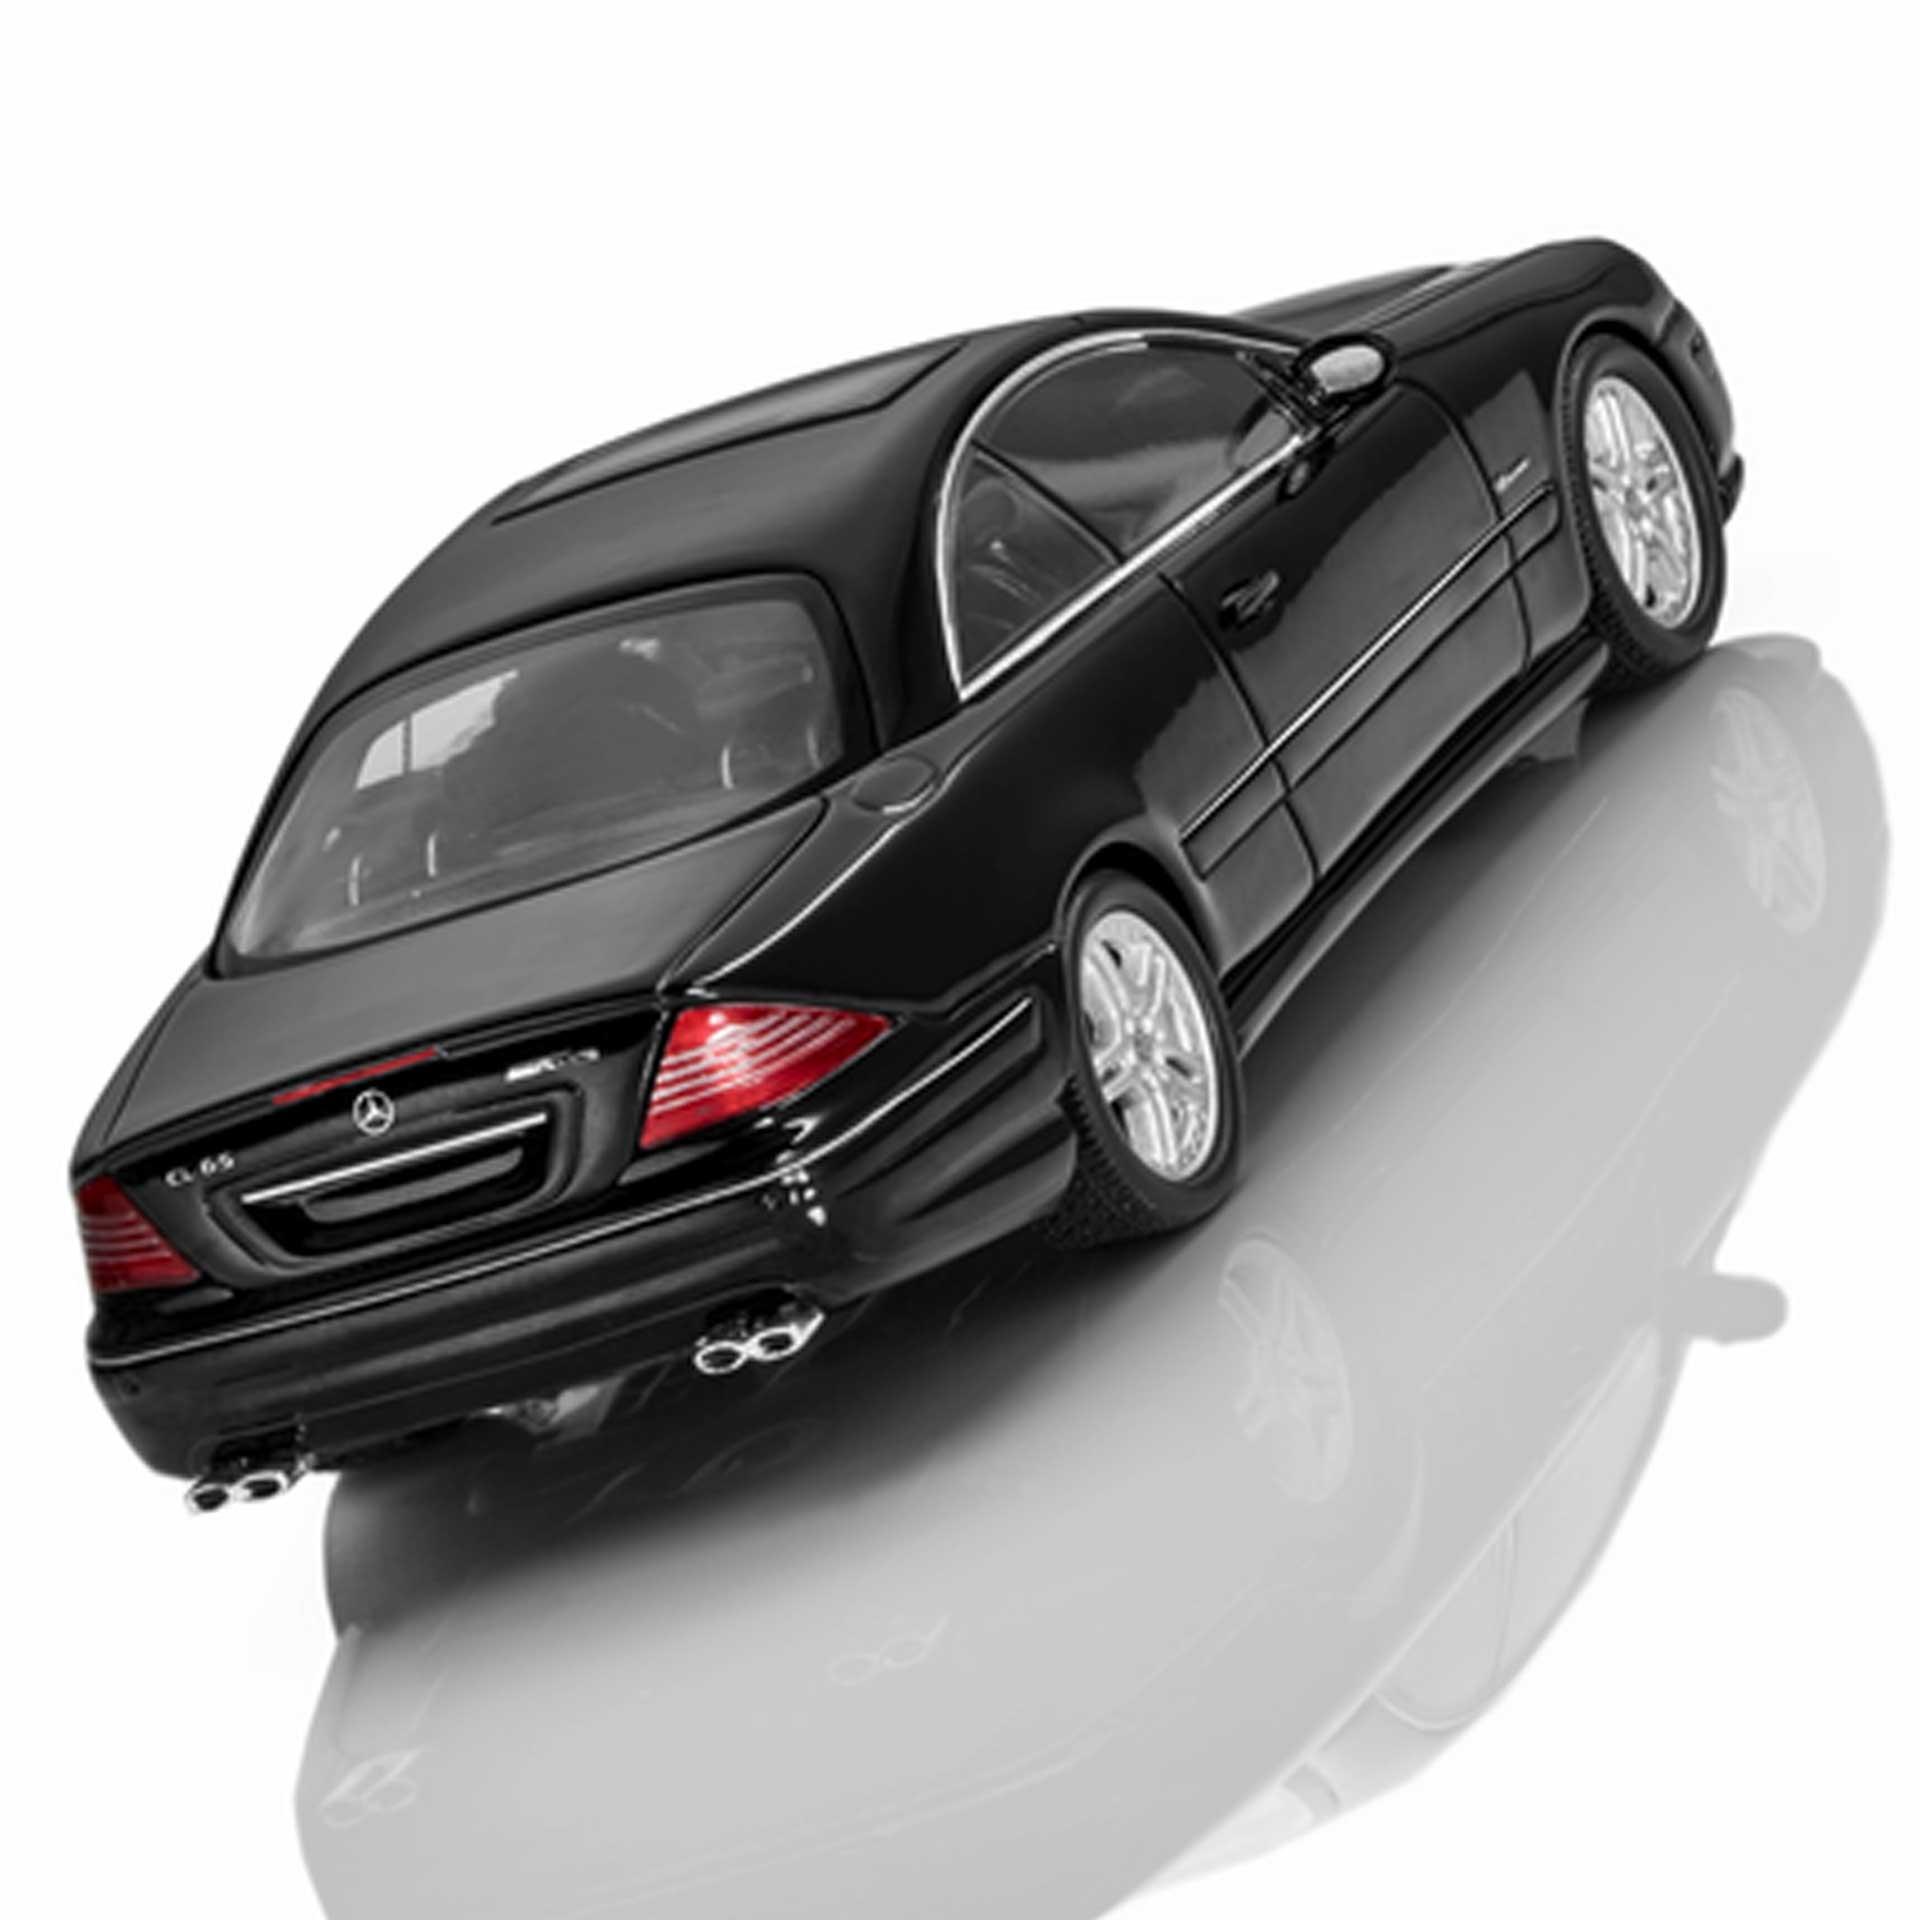 Mercedes-AMG Modellauto CL 65 AMG C 215 (2003-2005) 1:43